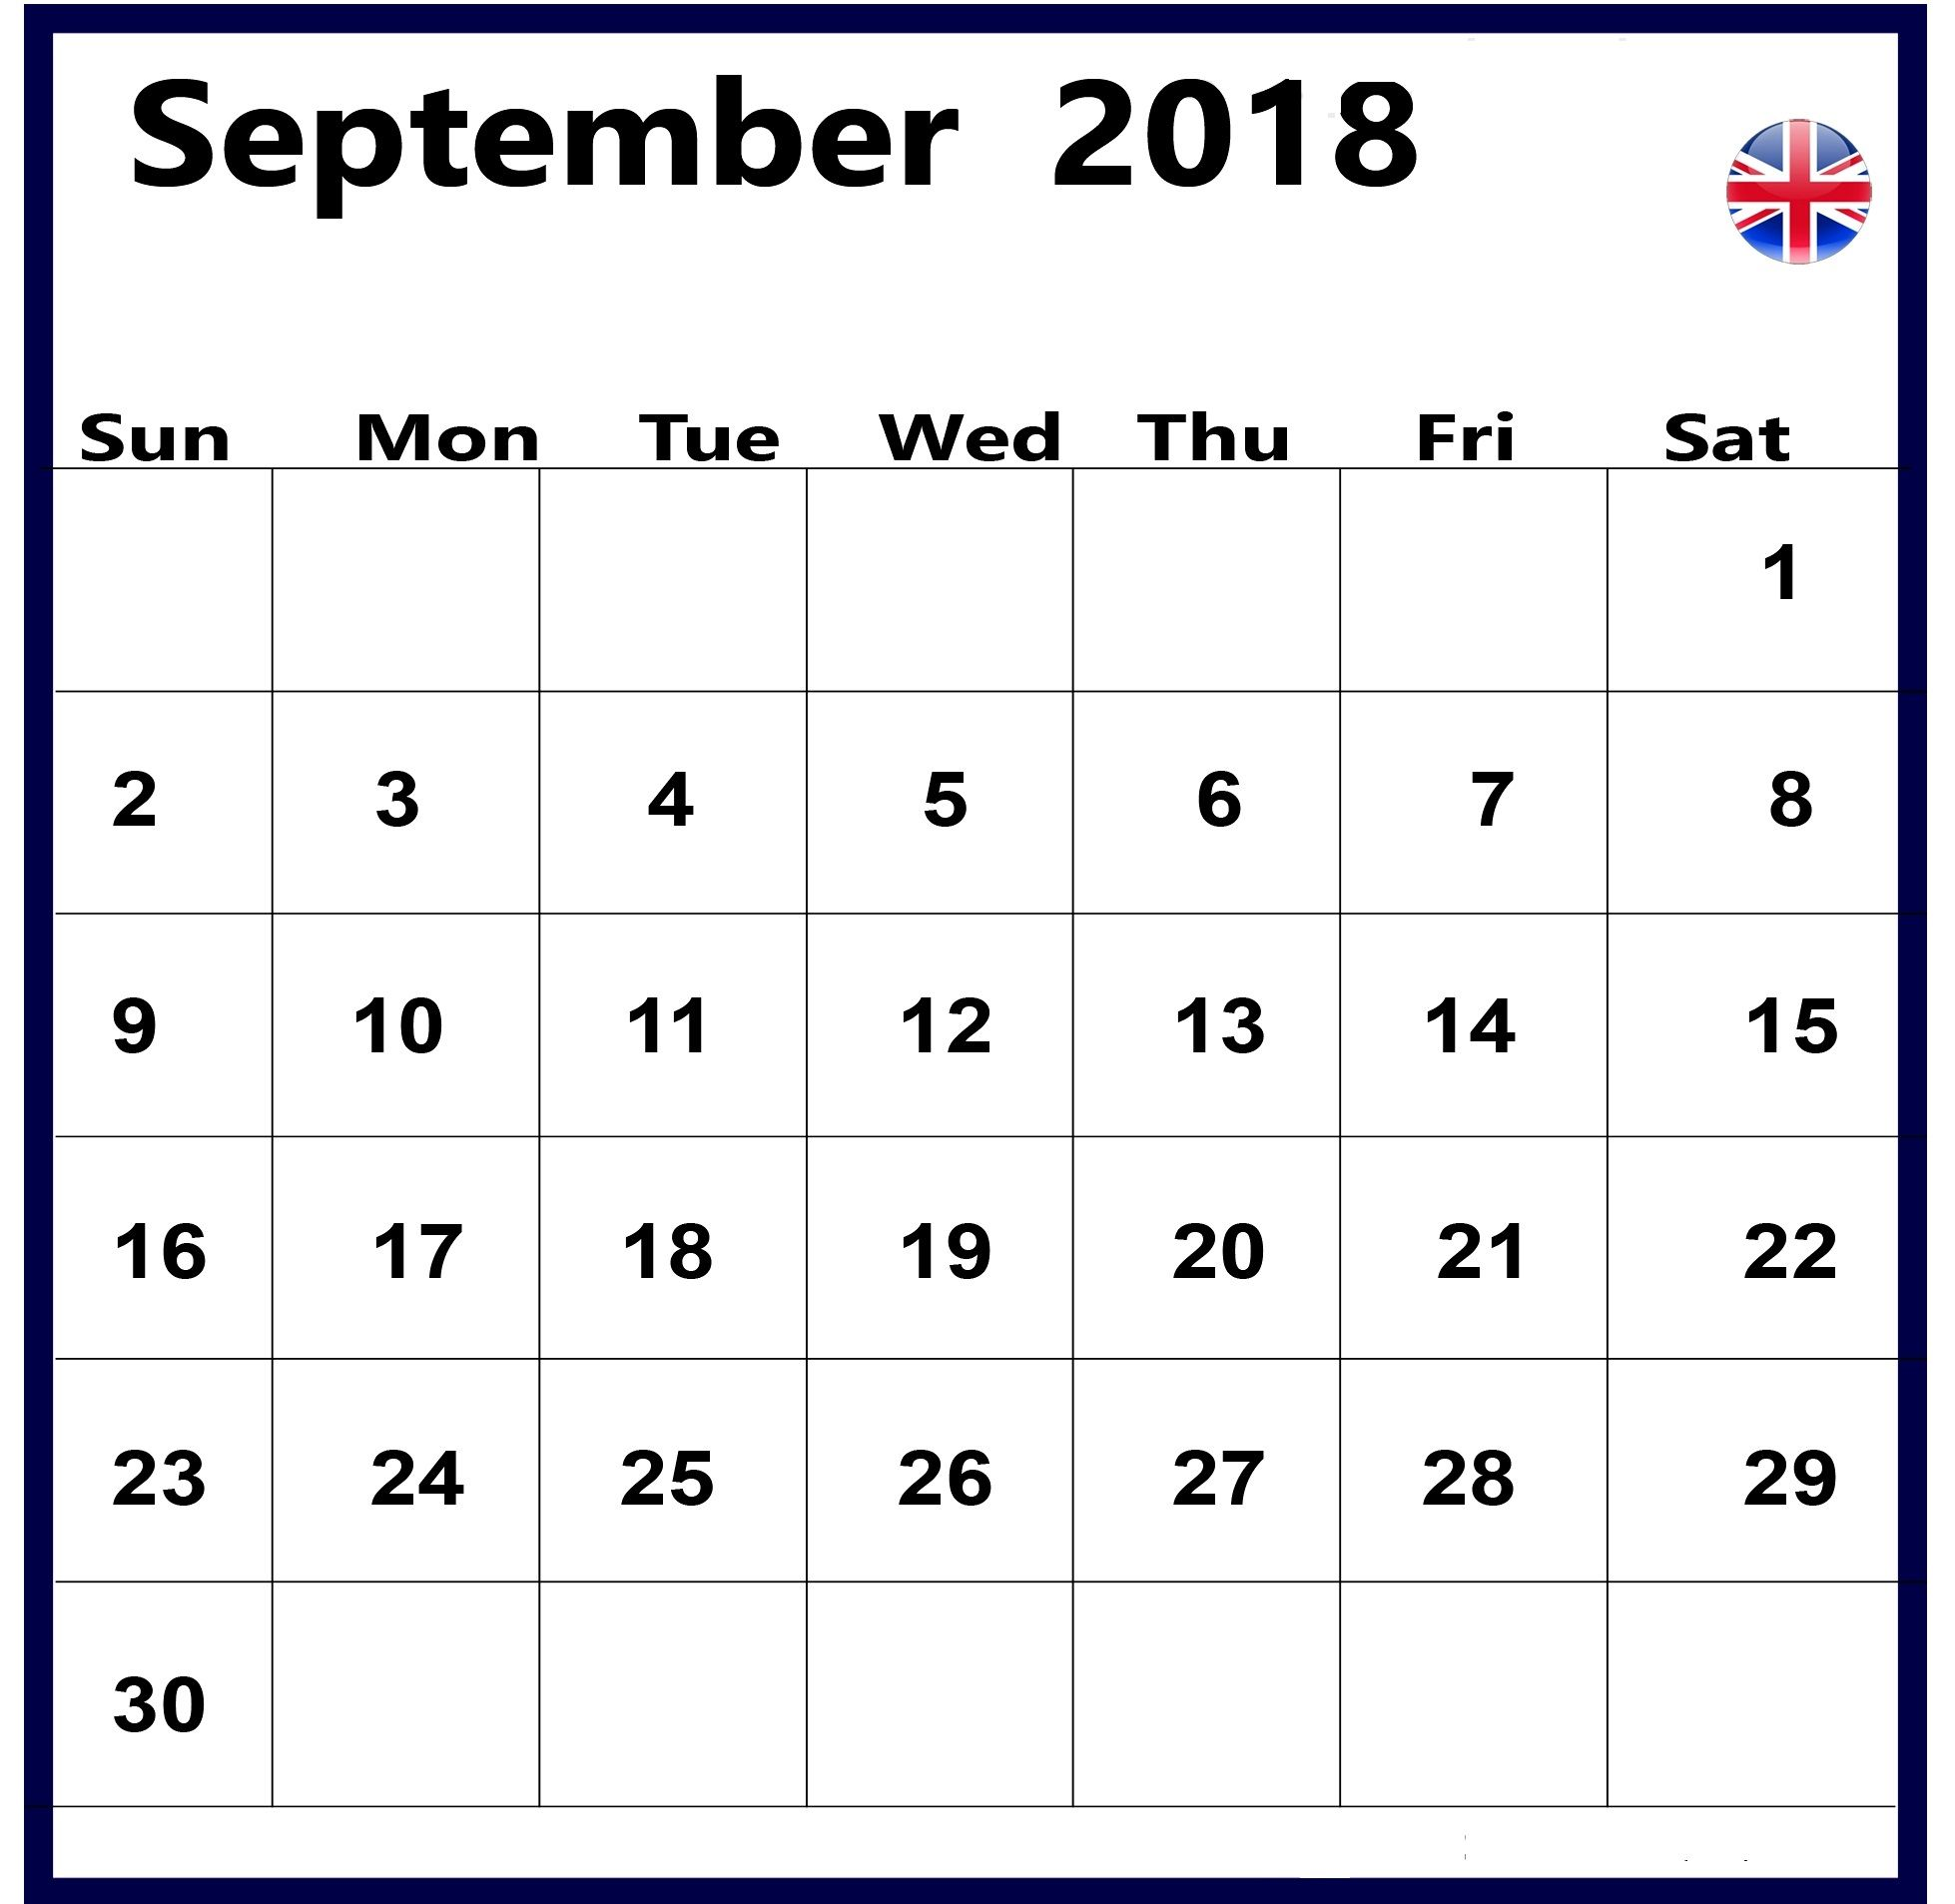 September 2018 Calendar Uk United Kingdom Holidays Calendar Uk